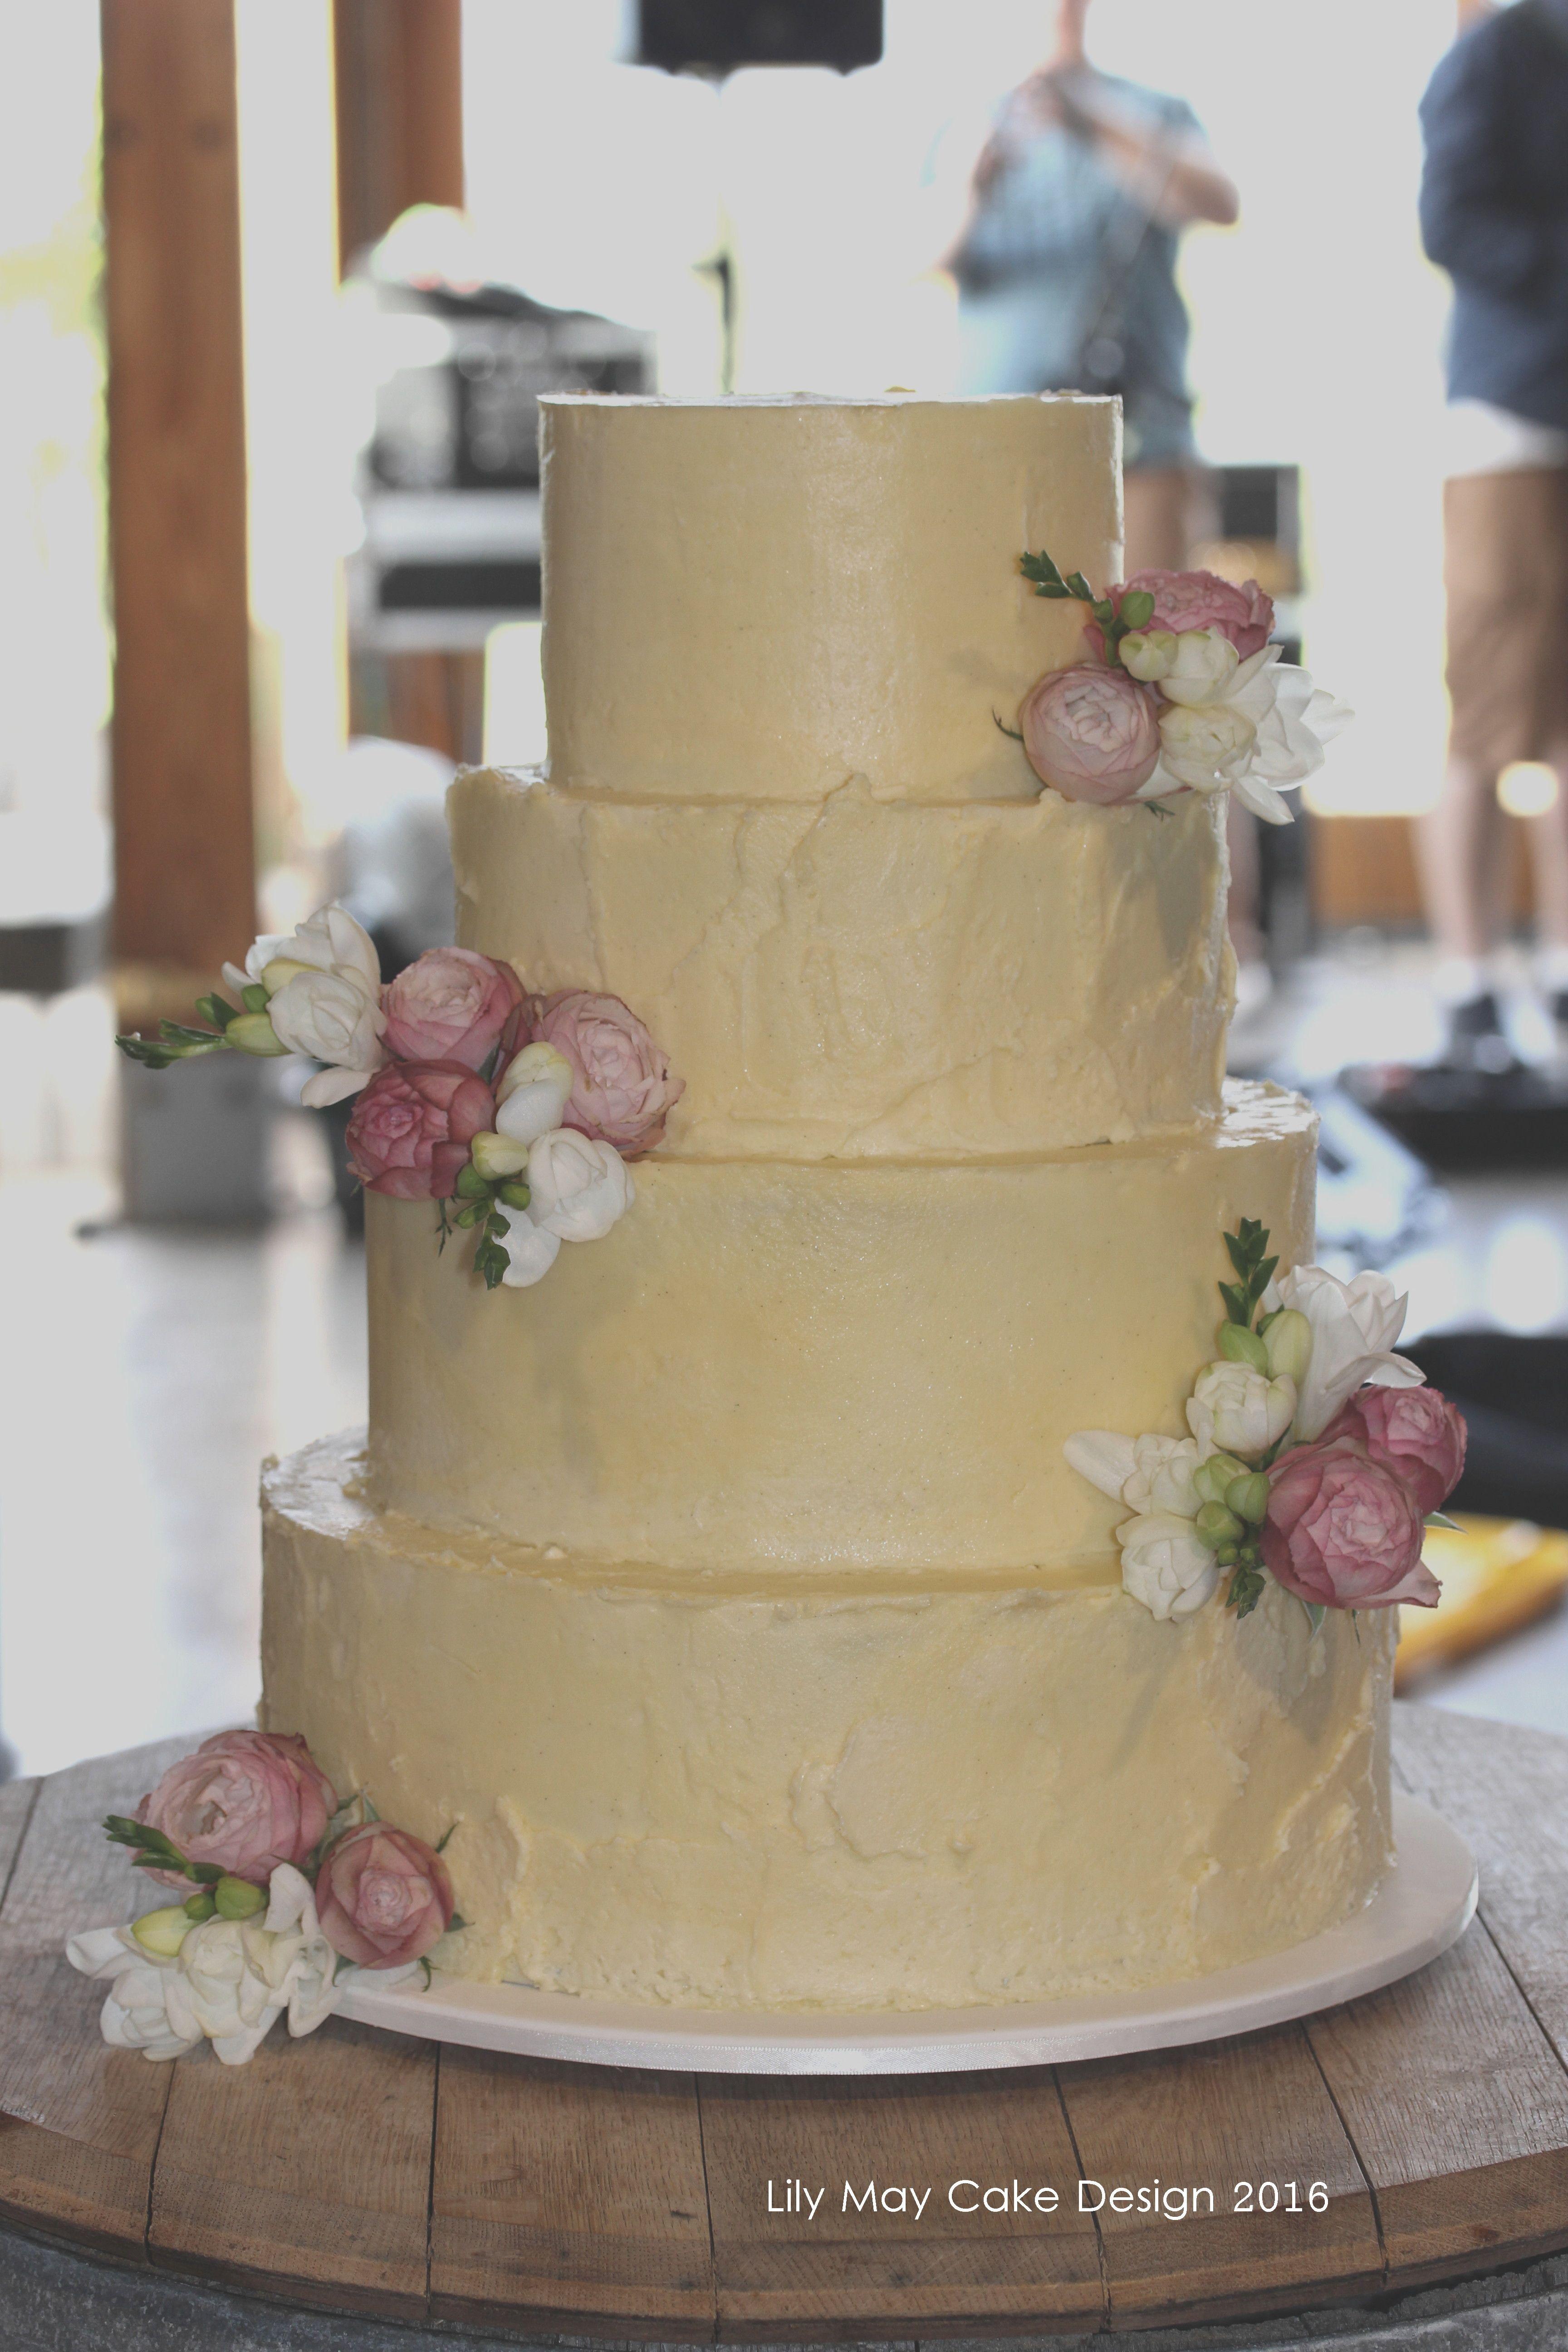 Swiss Meringue Ercream Wedding Cake